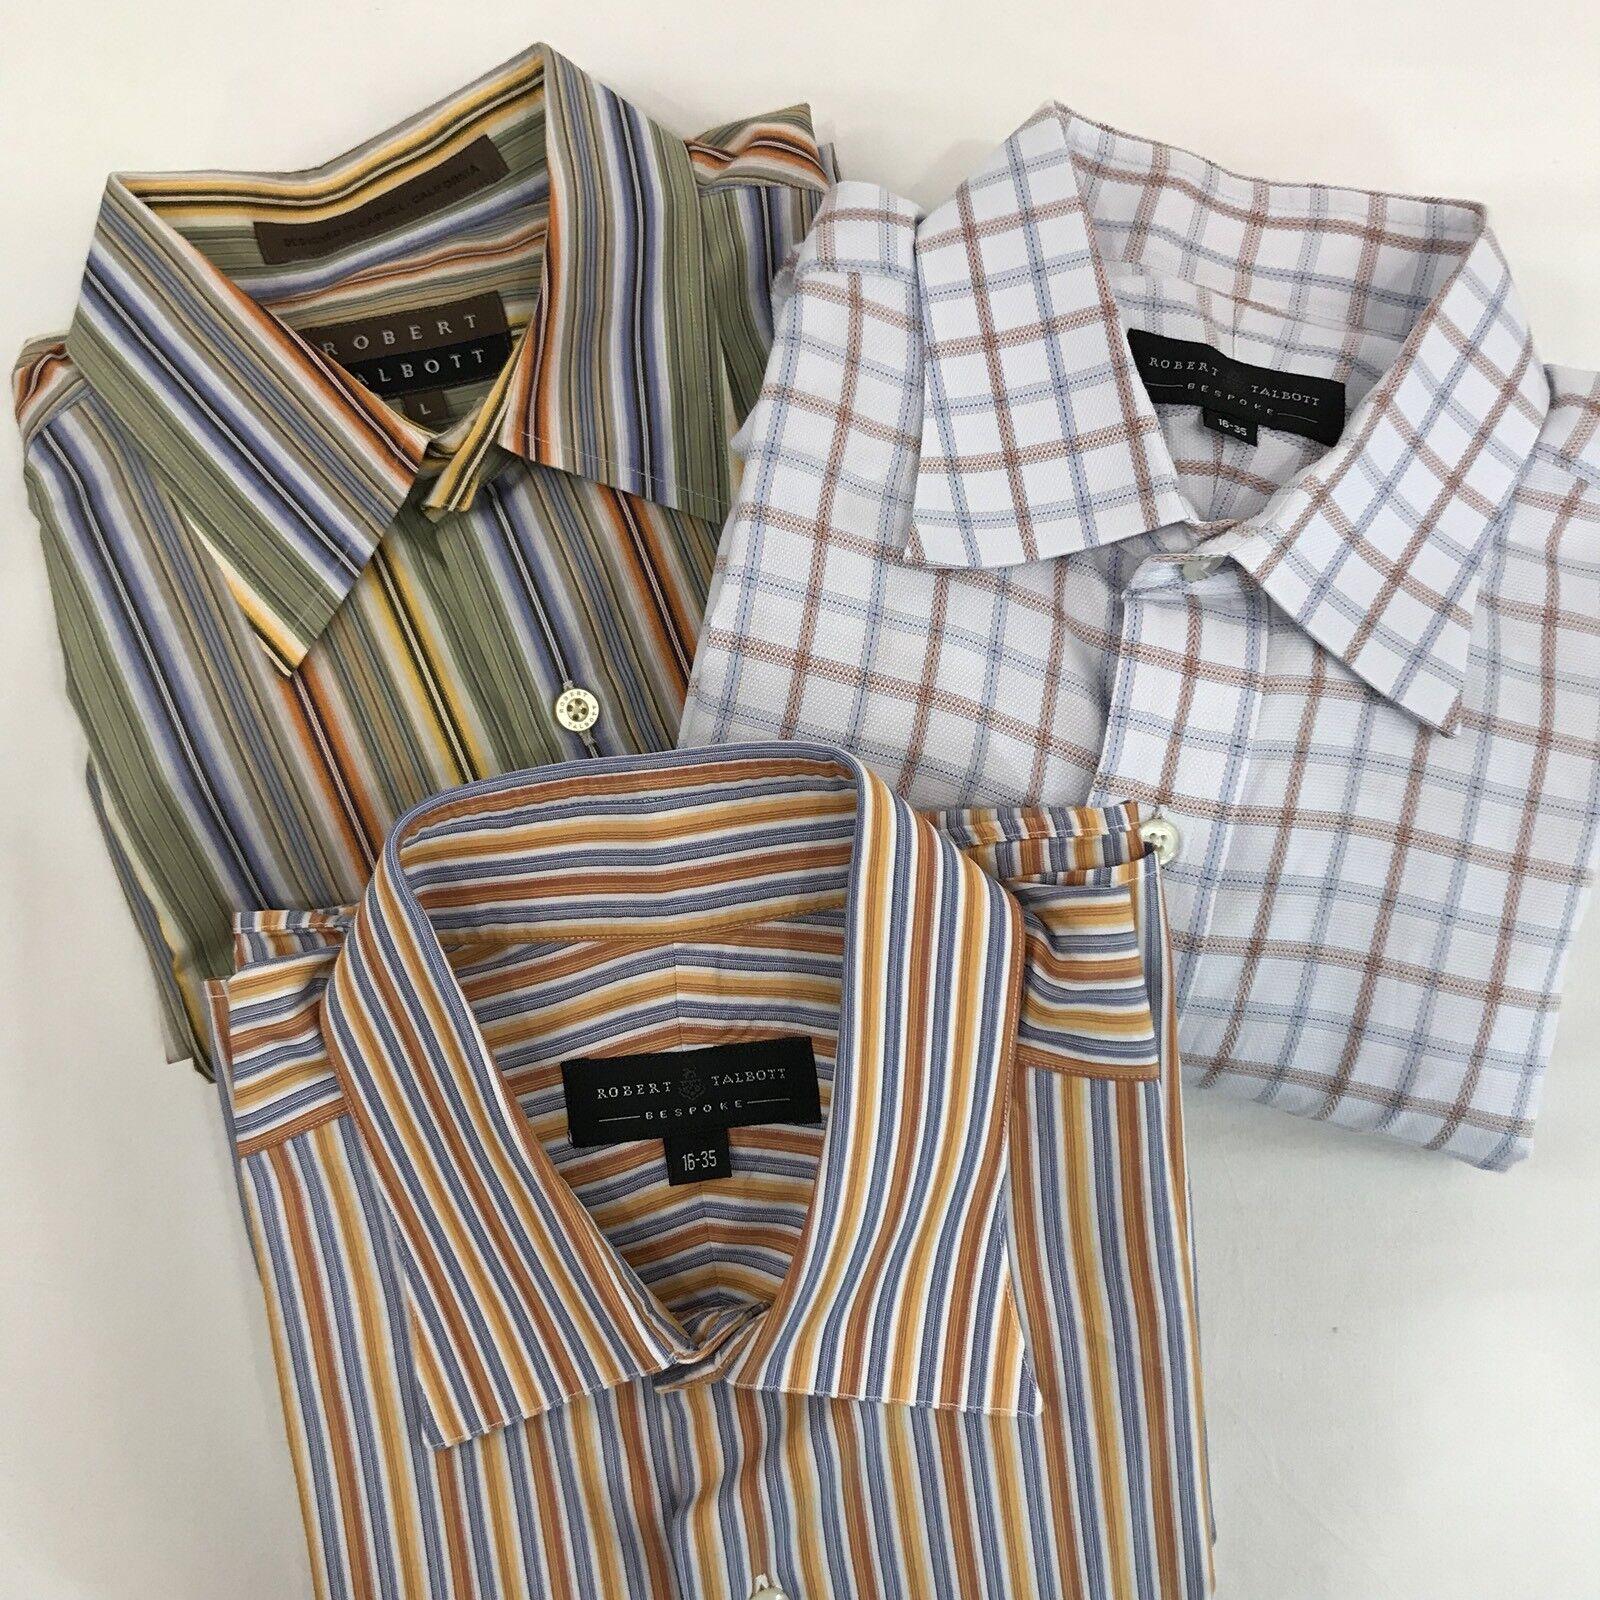 Robert Talbott Bespoke Shirts Sz 16 35 Large Striped Plaid Button Down Lot of 3